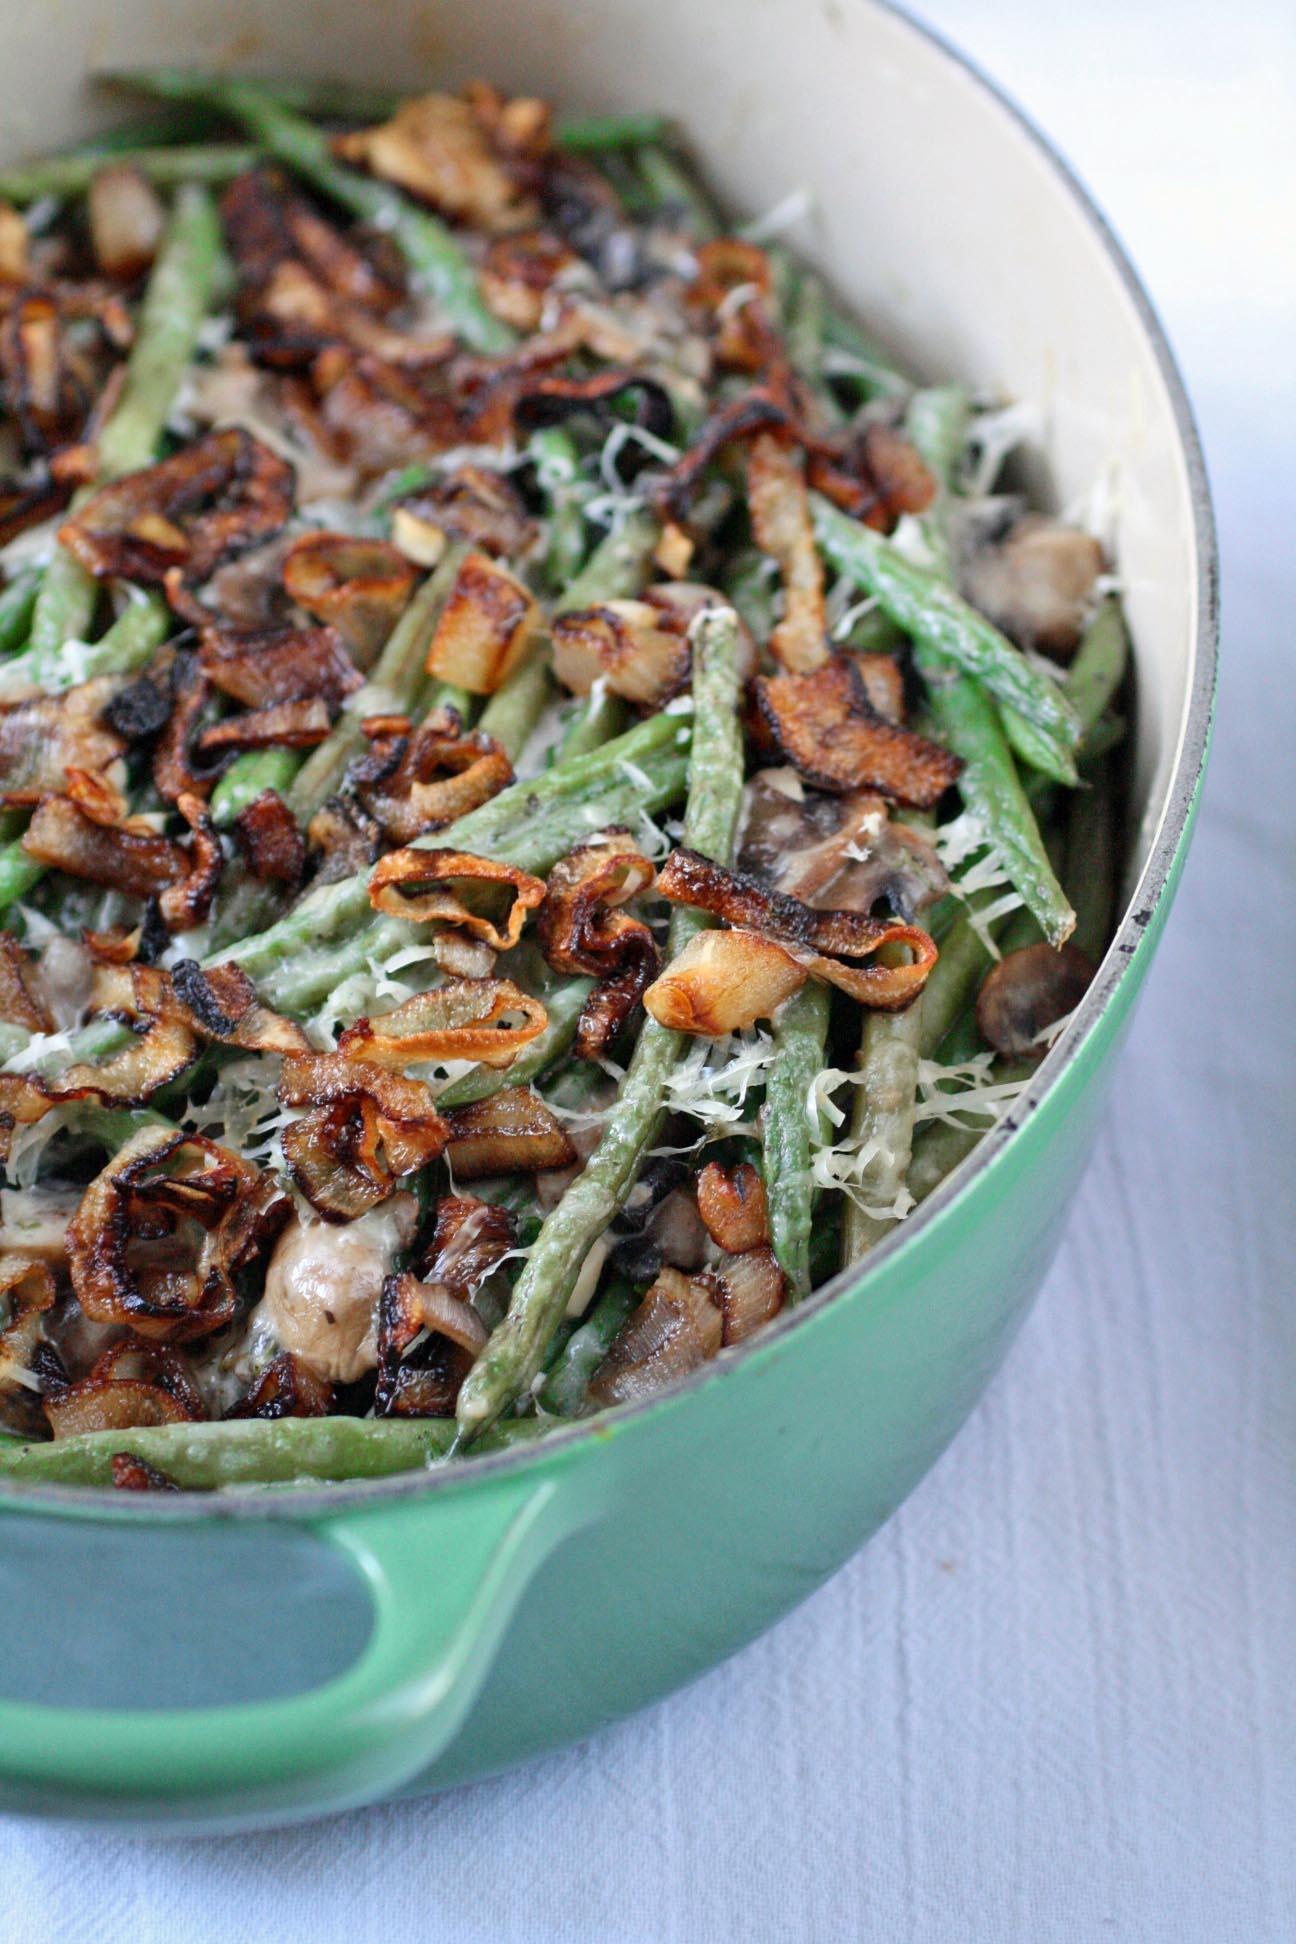 Homemade Green Bean Casserole With Crispy Shallots